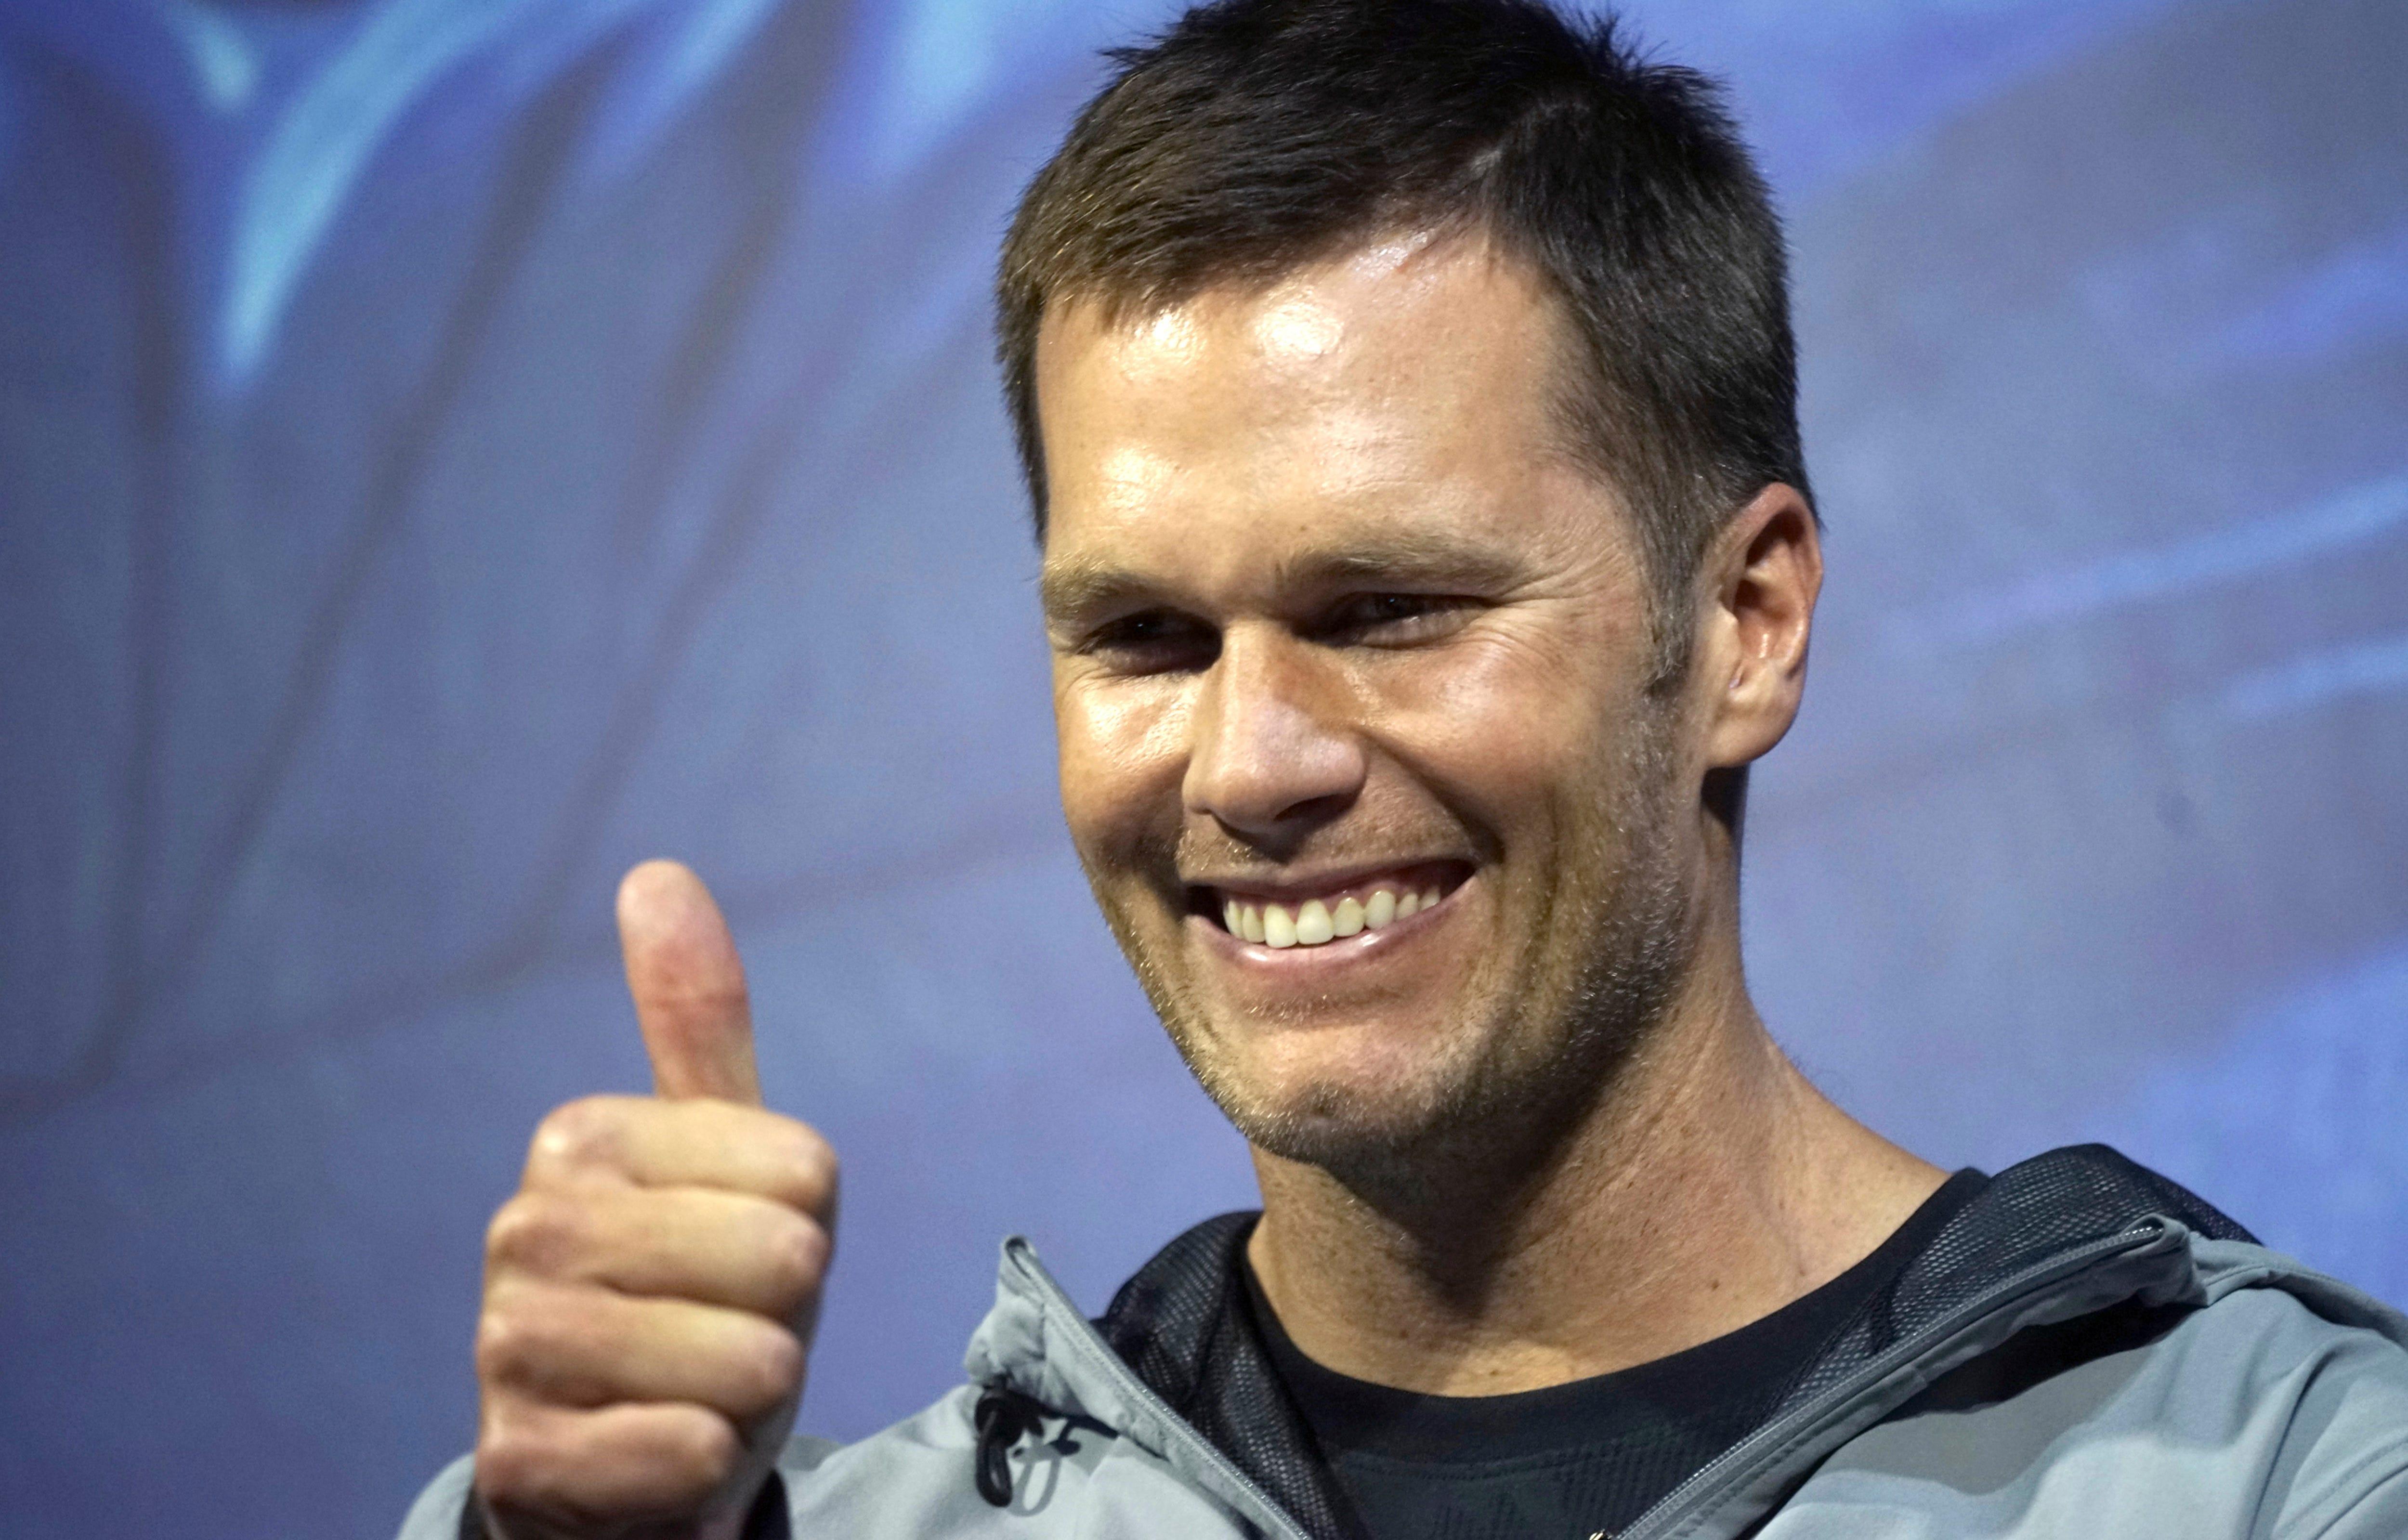 Google glitch makes Tom Brady owner of the Jets